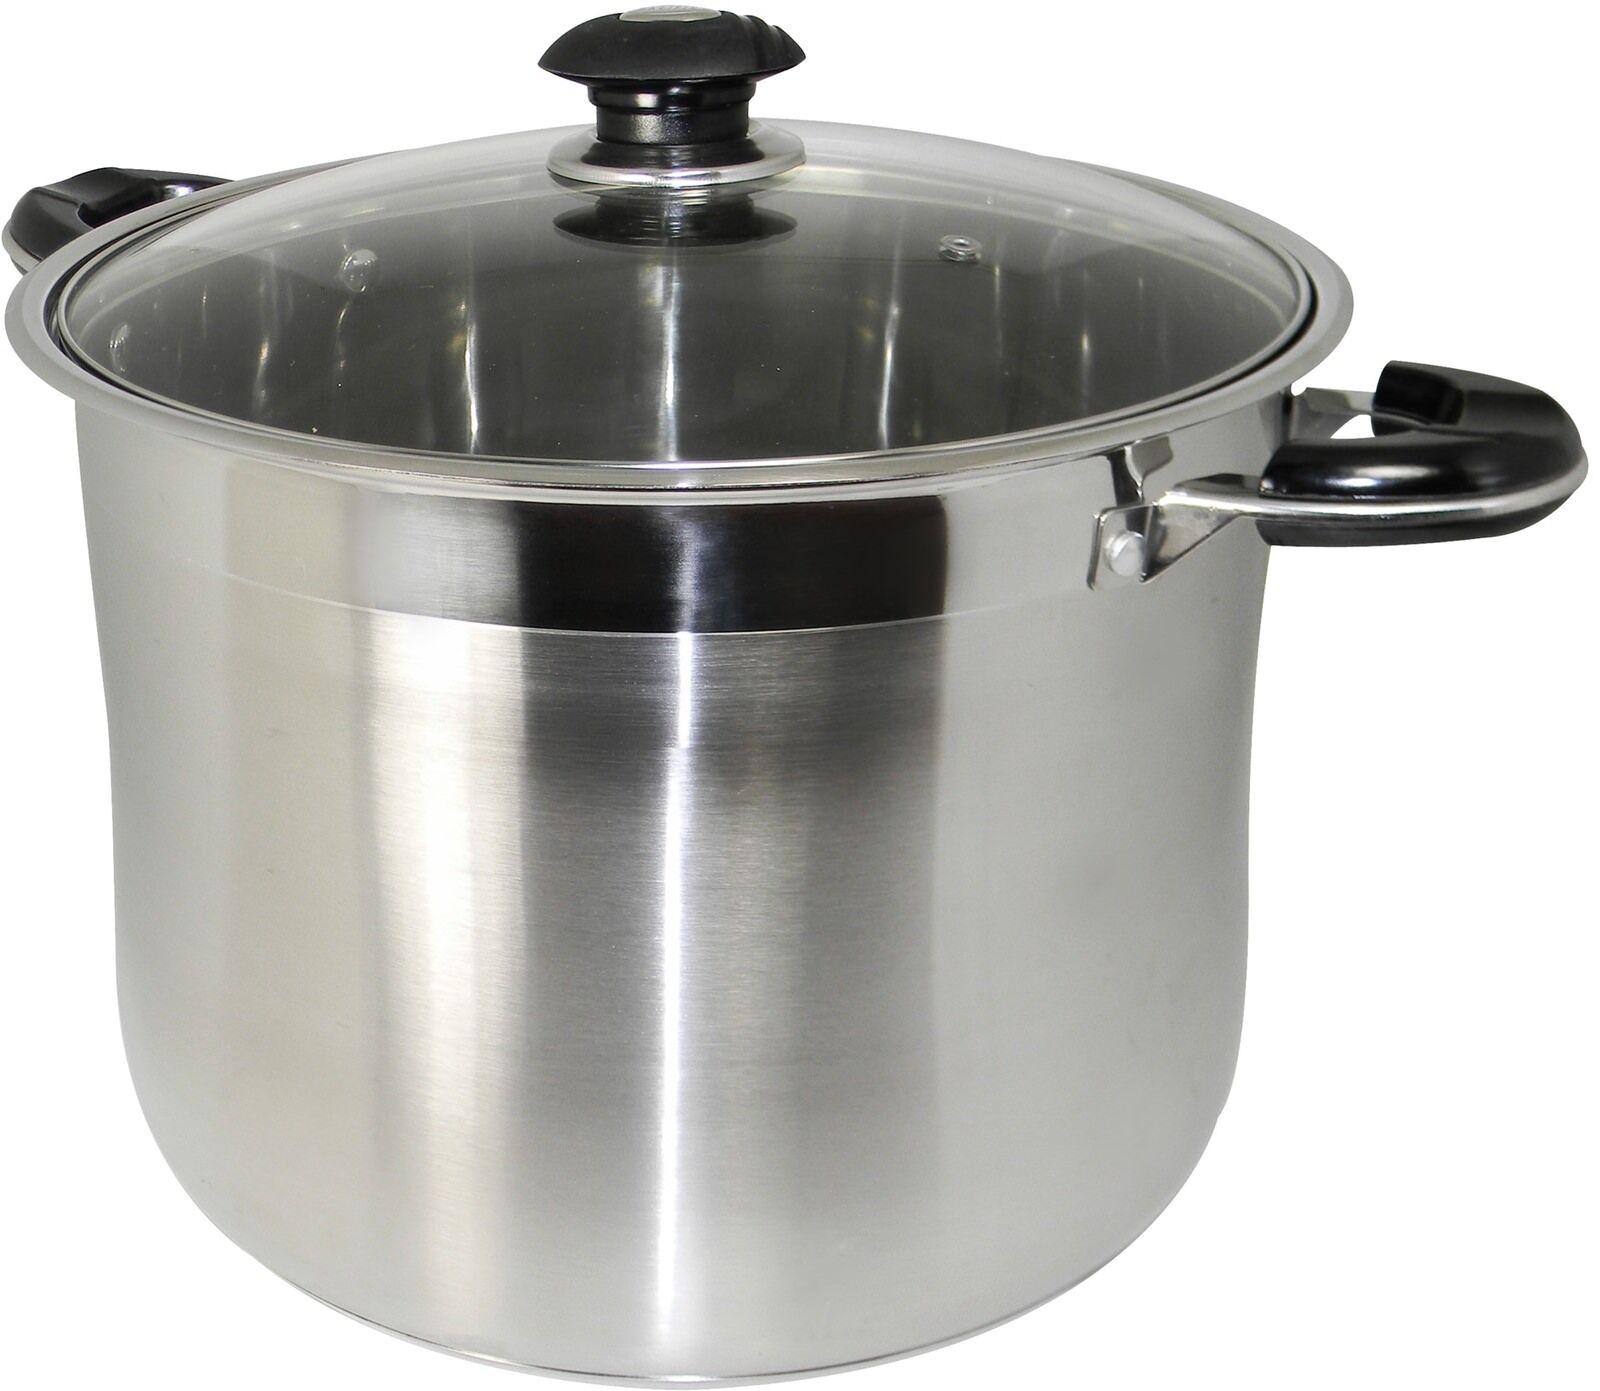 Casserole Faitout Gourmet Tri Pli Cookware Heavy Duty en Acier Inoxydable 20 QT